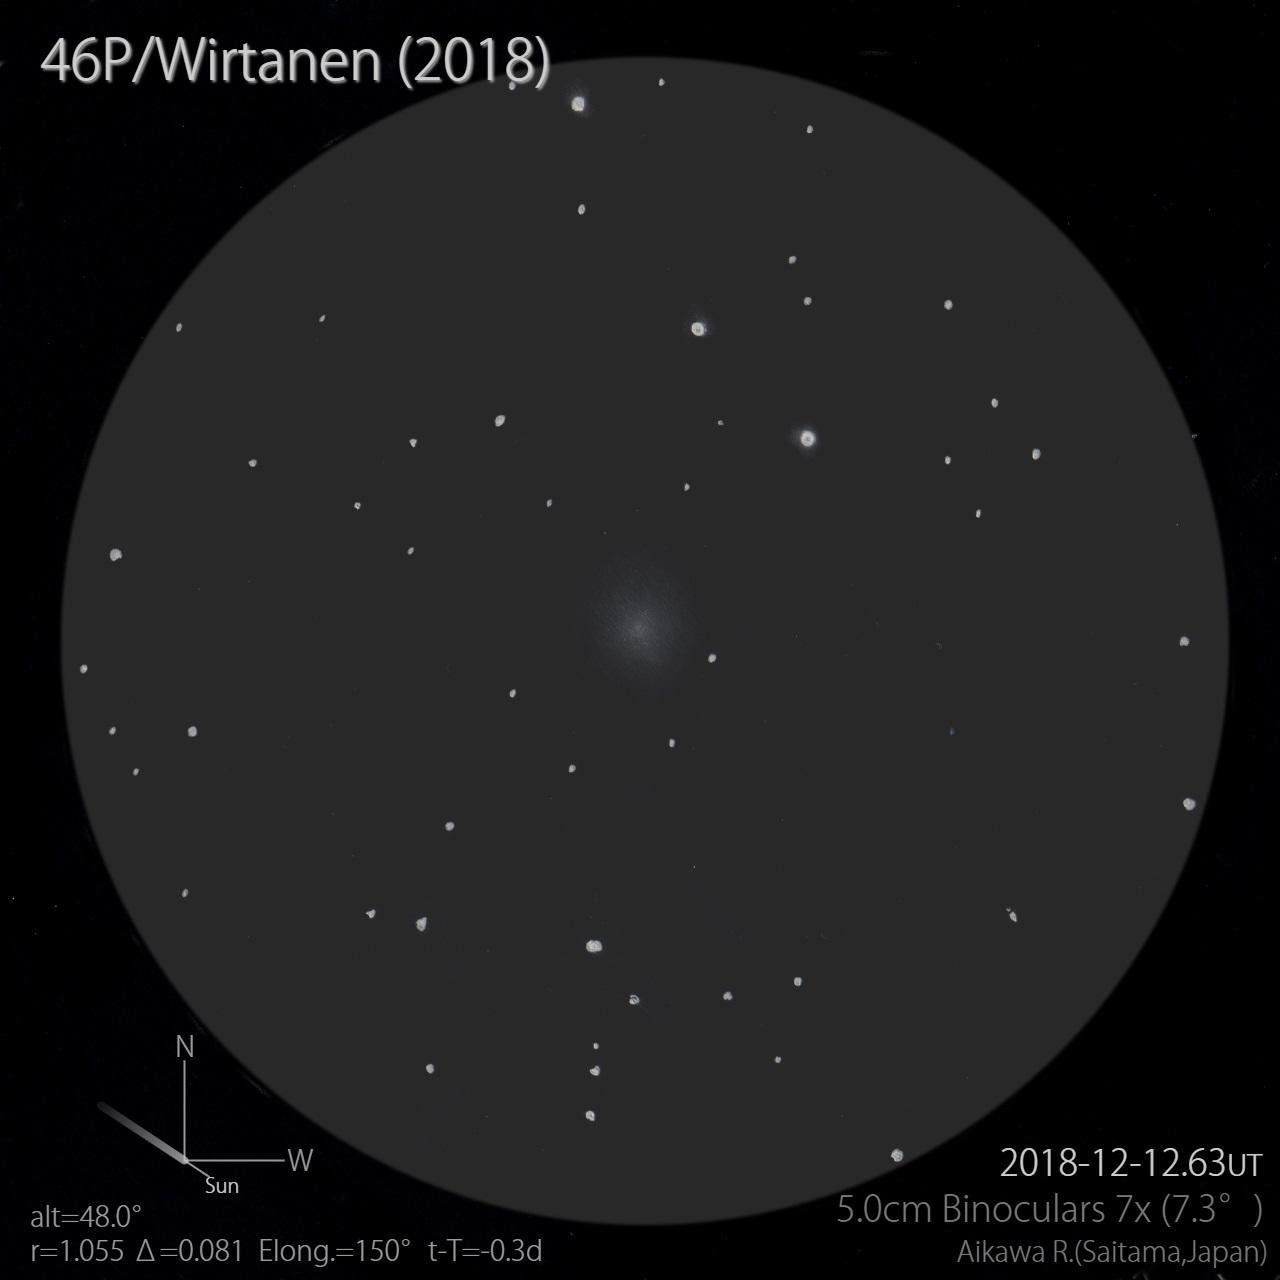 0046P-2018_007-editPosi-40-0.8.jpg